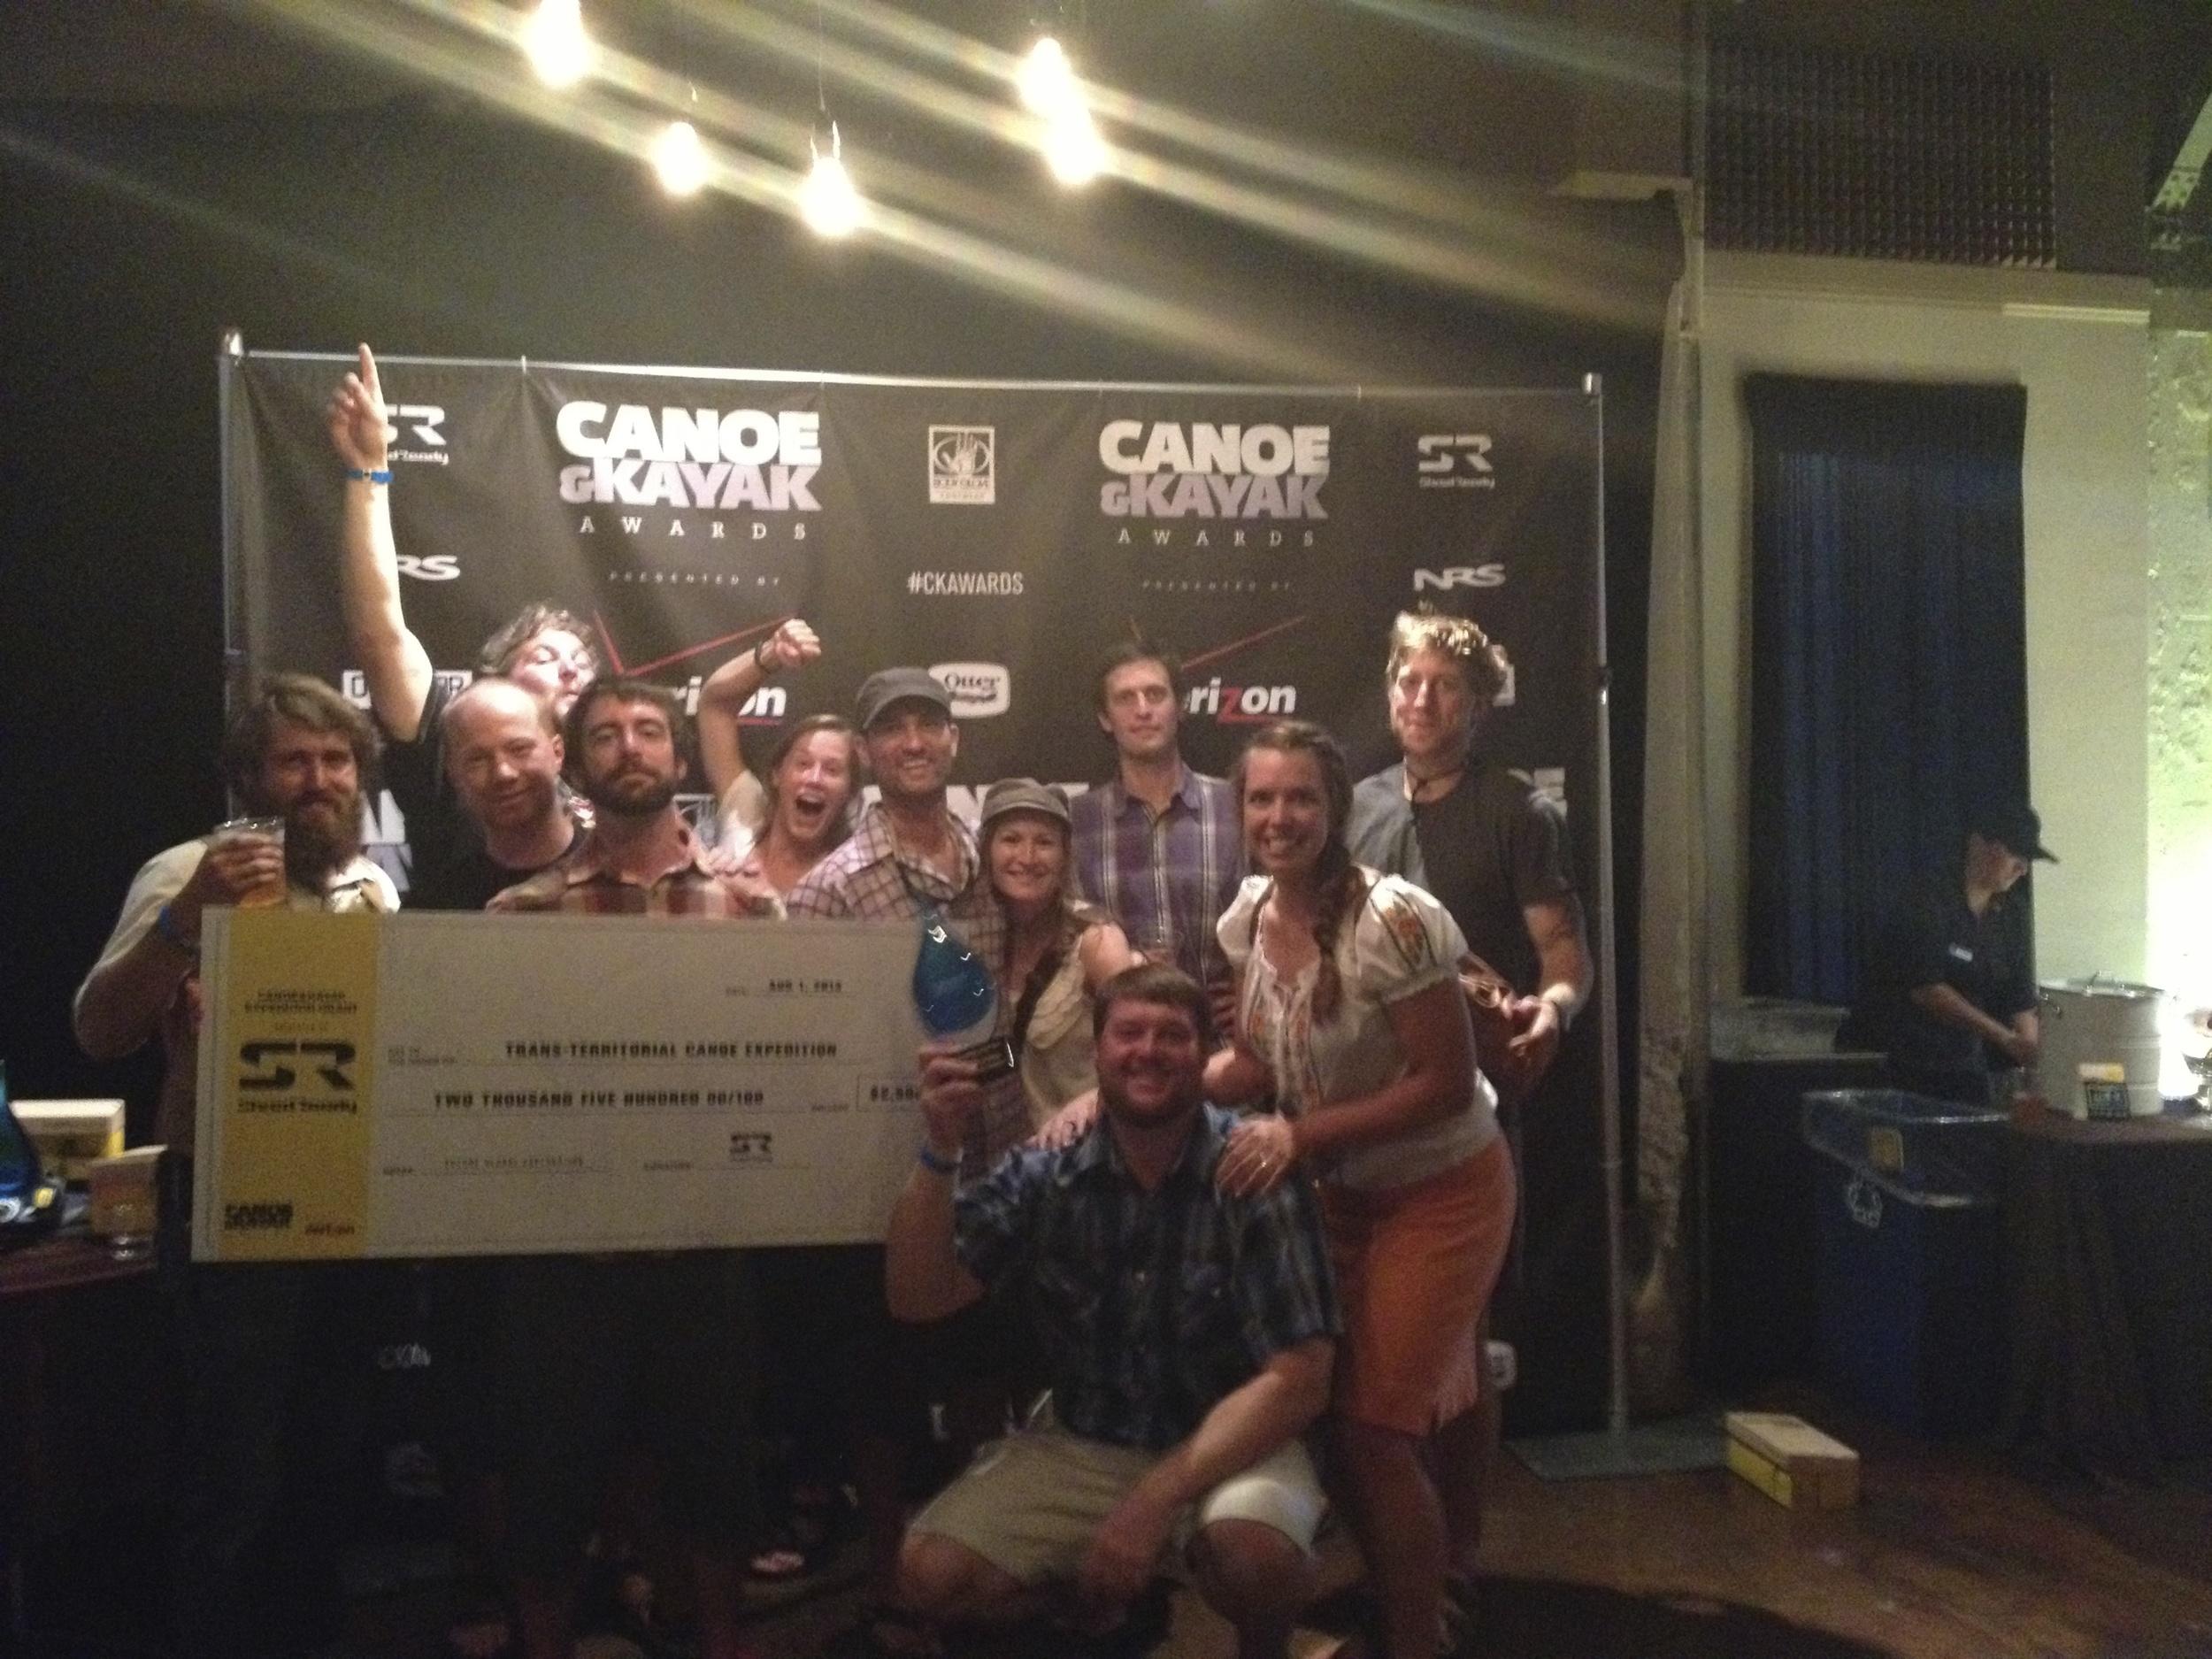 Fun photo shoot at the Canoe and Kayak Awards in Salt Lake City (Summer 2013)